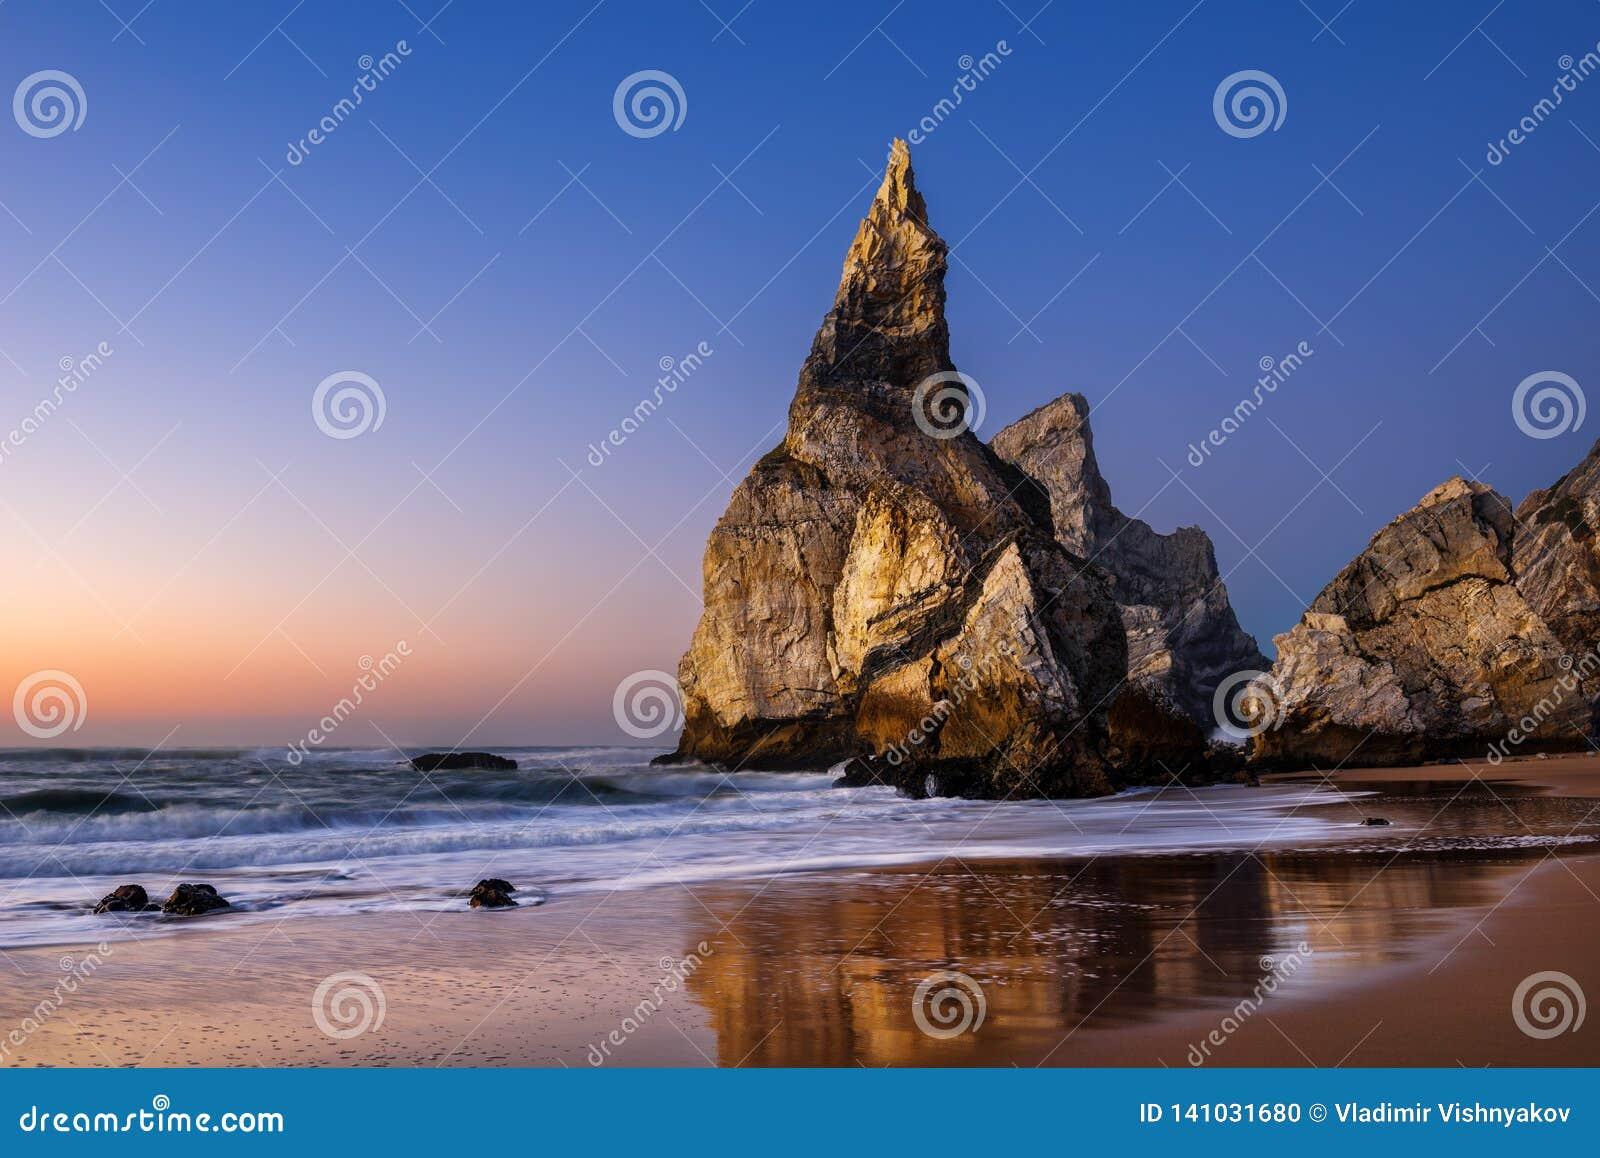 Ursa beach at sunset, Sintra, Portugal